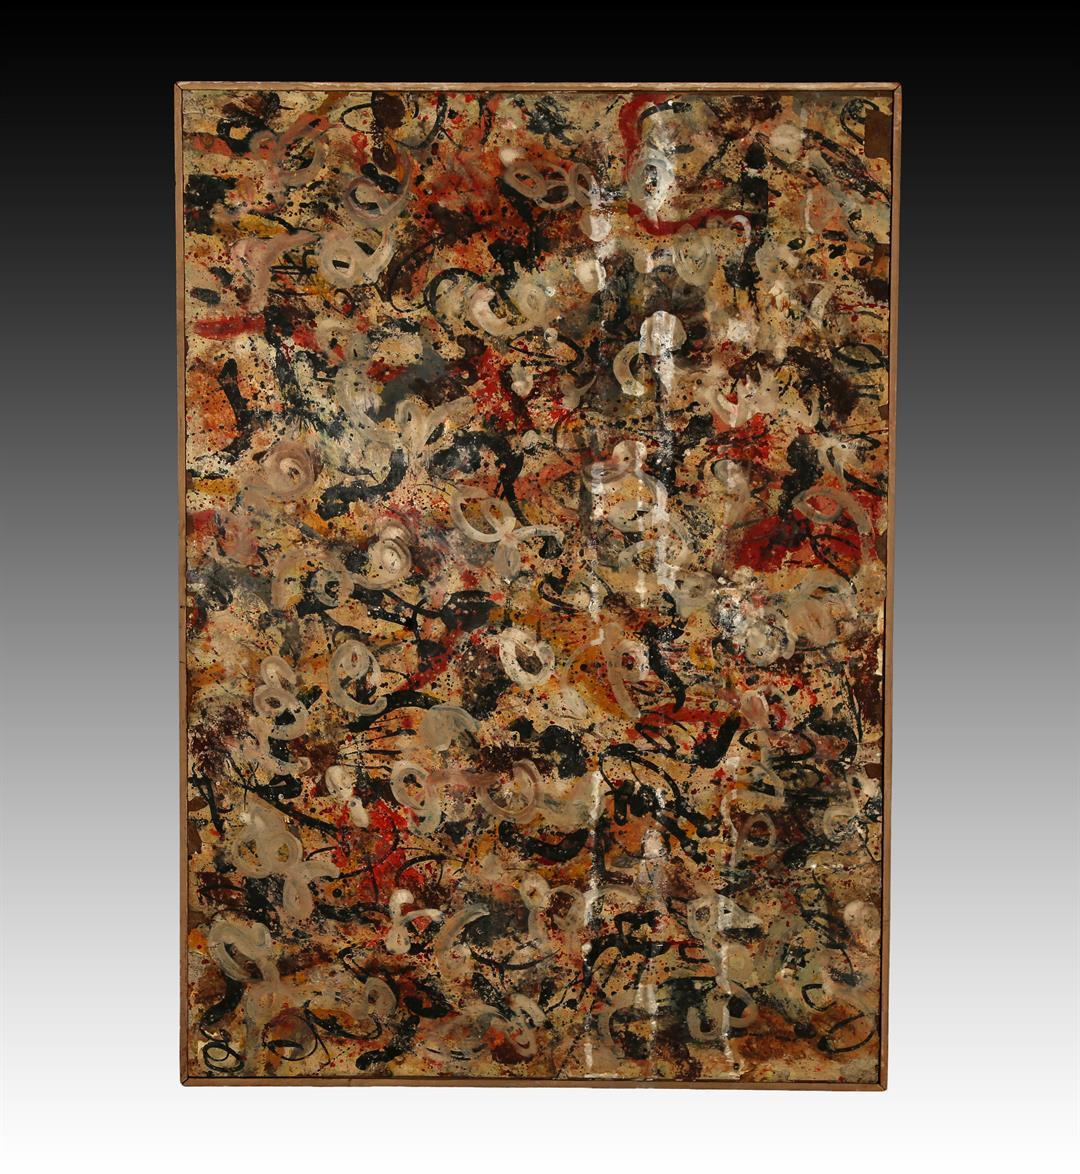 Jackson Pollock gouache painting (Photo courtesy of J. Levine Auction & Appraisal)